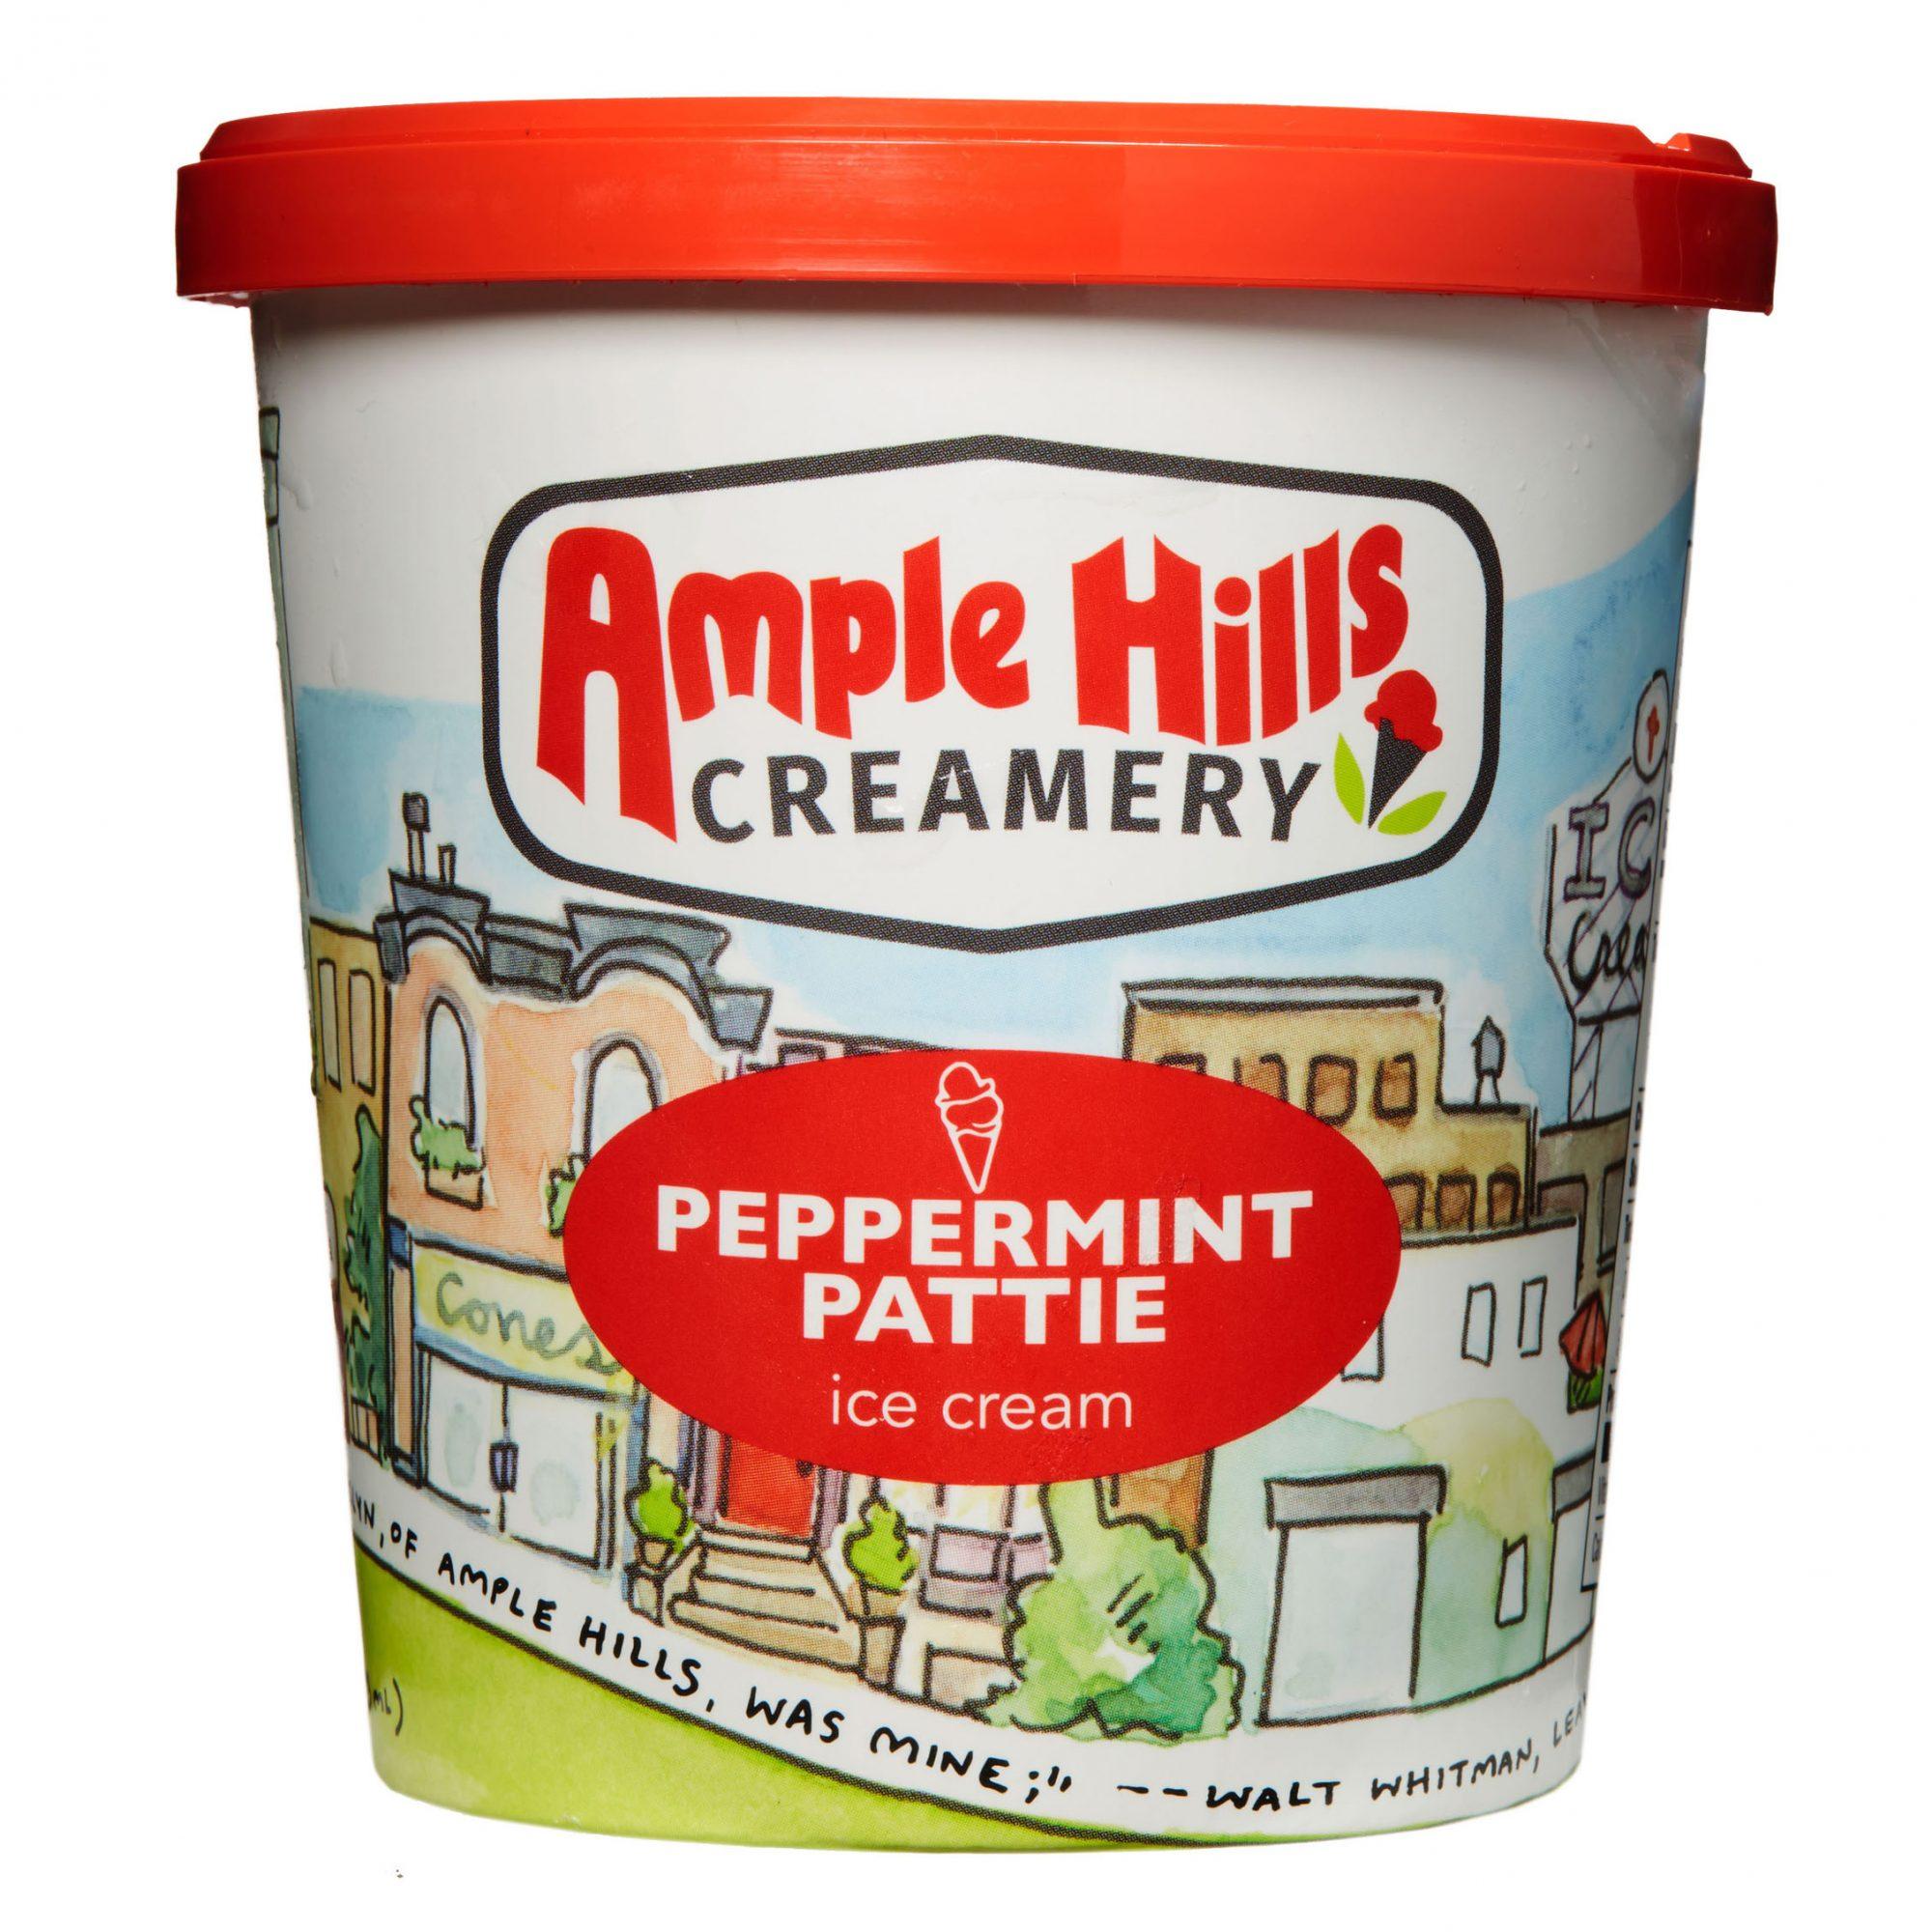 ample hills creamery peppermint pattie